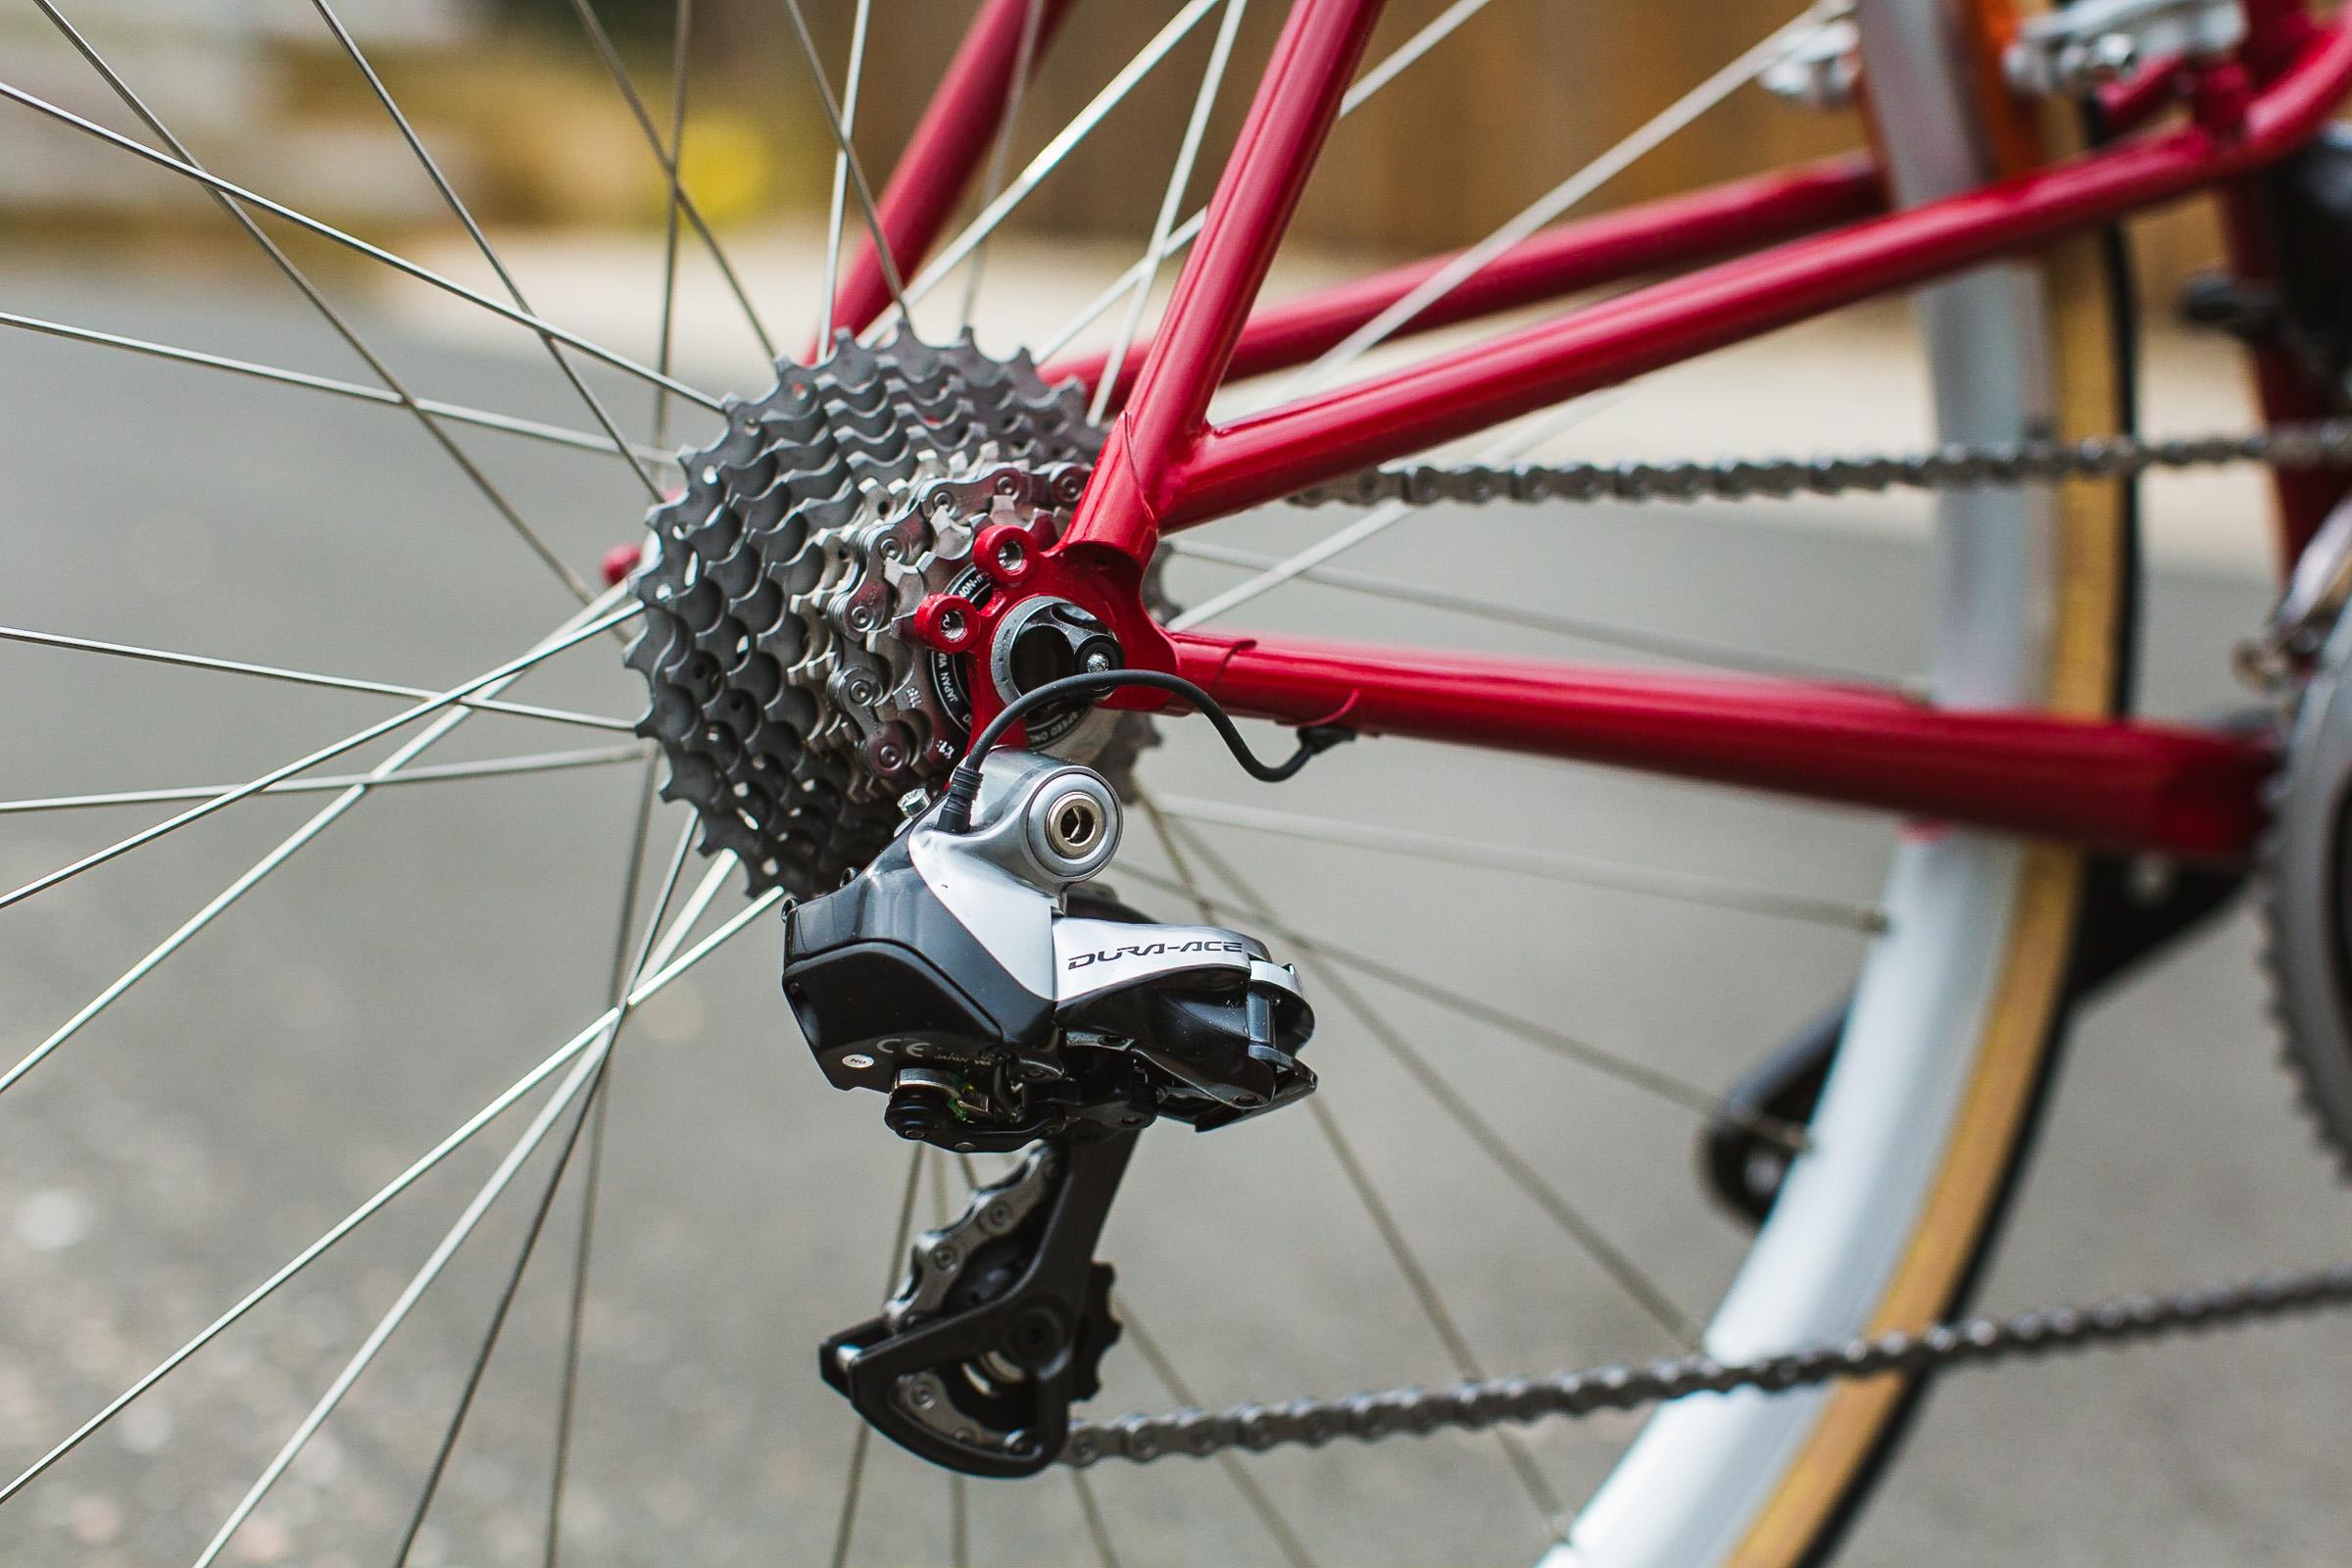 057.yipsan-bicycles-creators-series.traverse.jpg